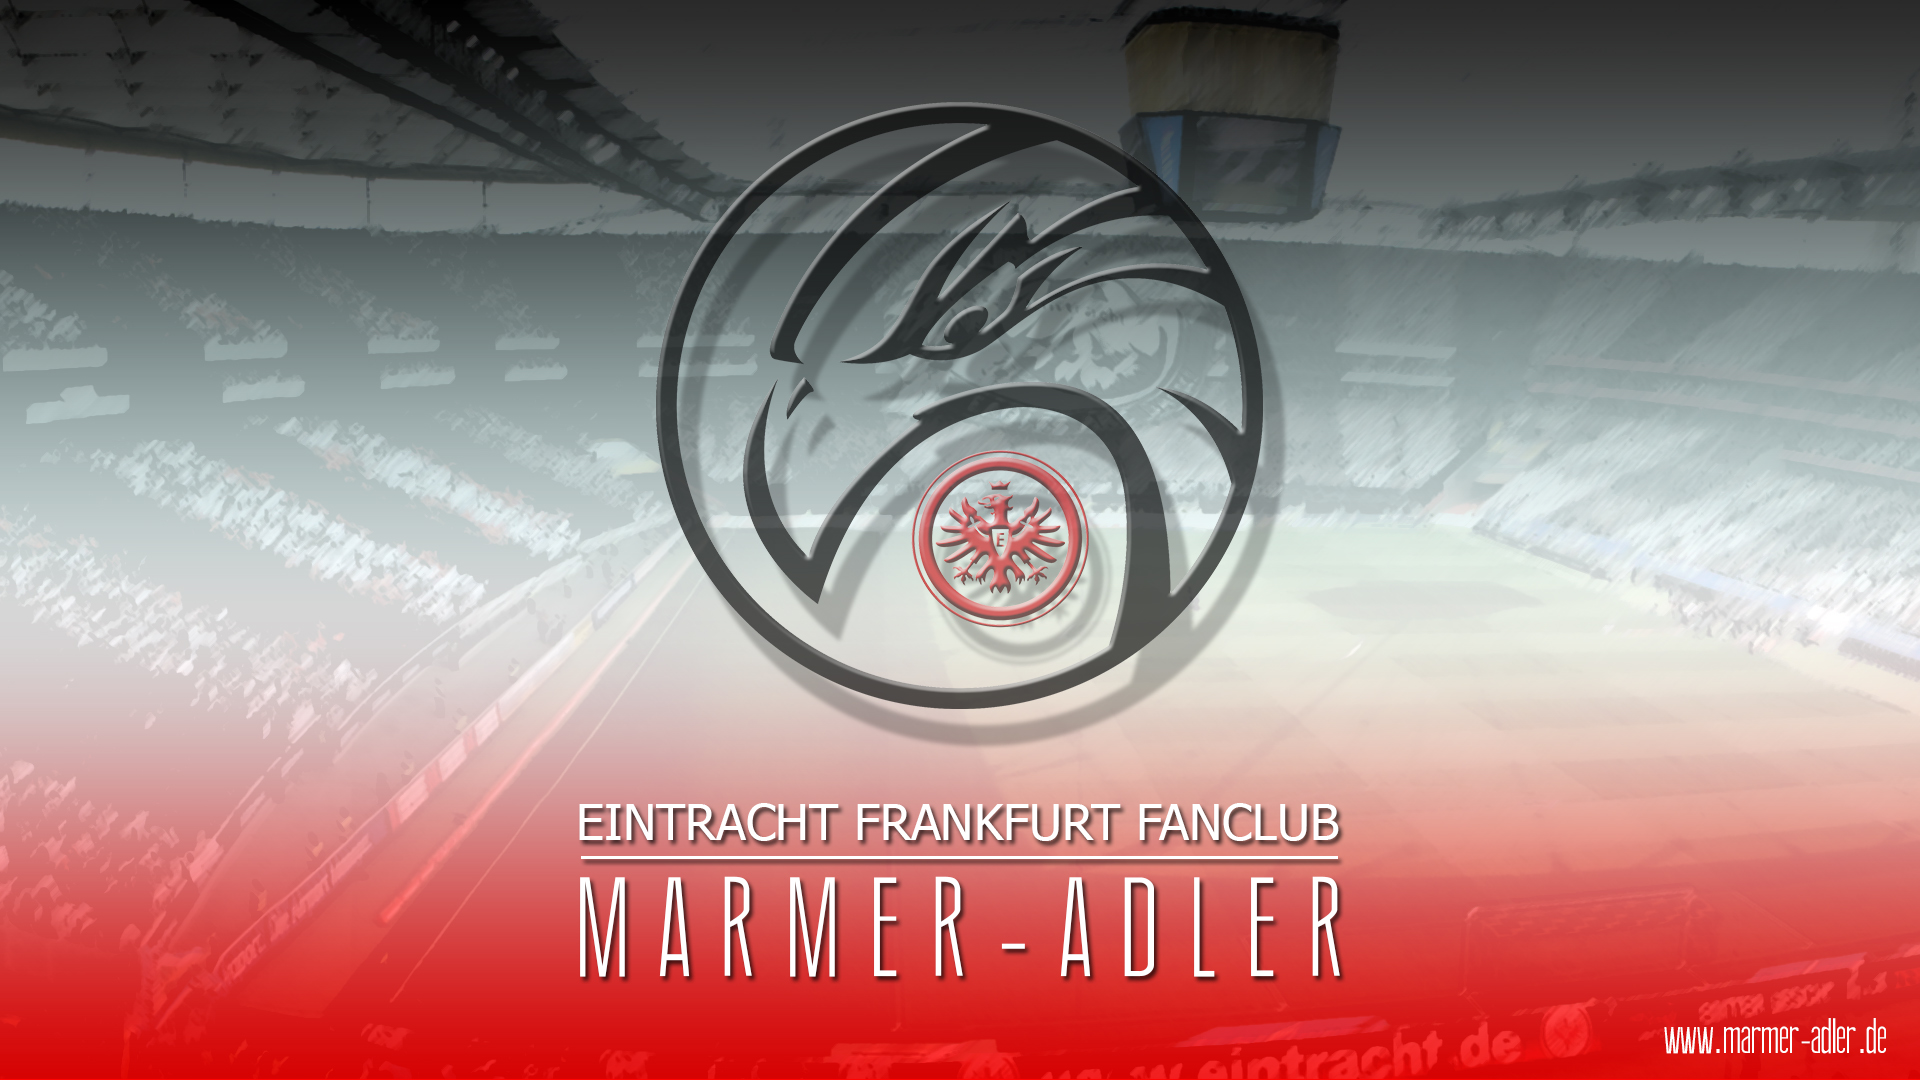 EINTRACHT_FRANKFURT_MARMER_ADLER_WALLPAPER_1920x1090.jpg